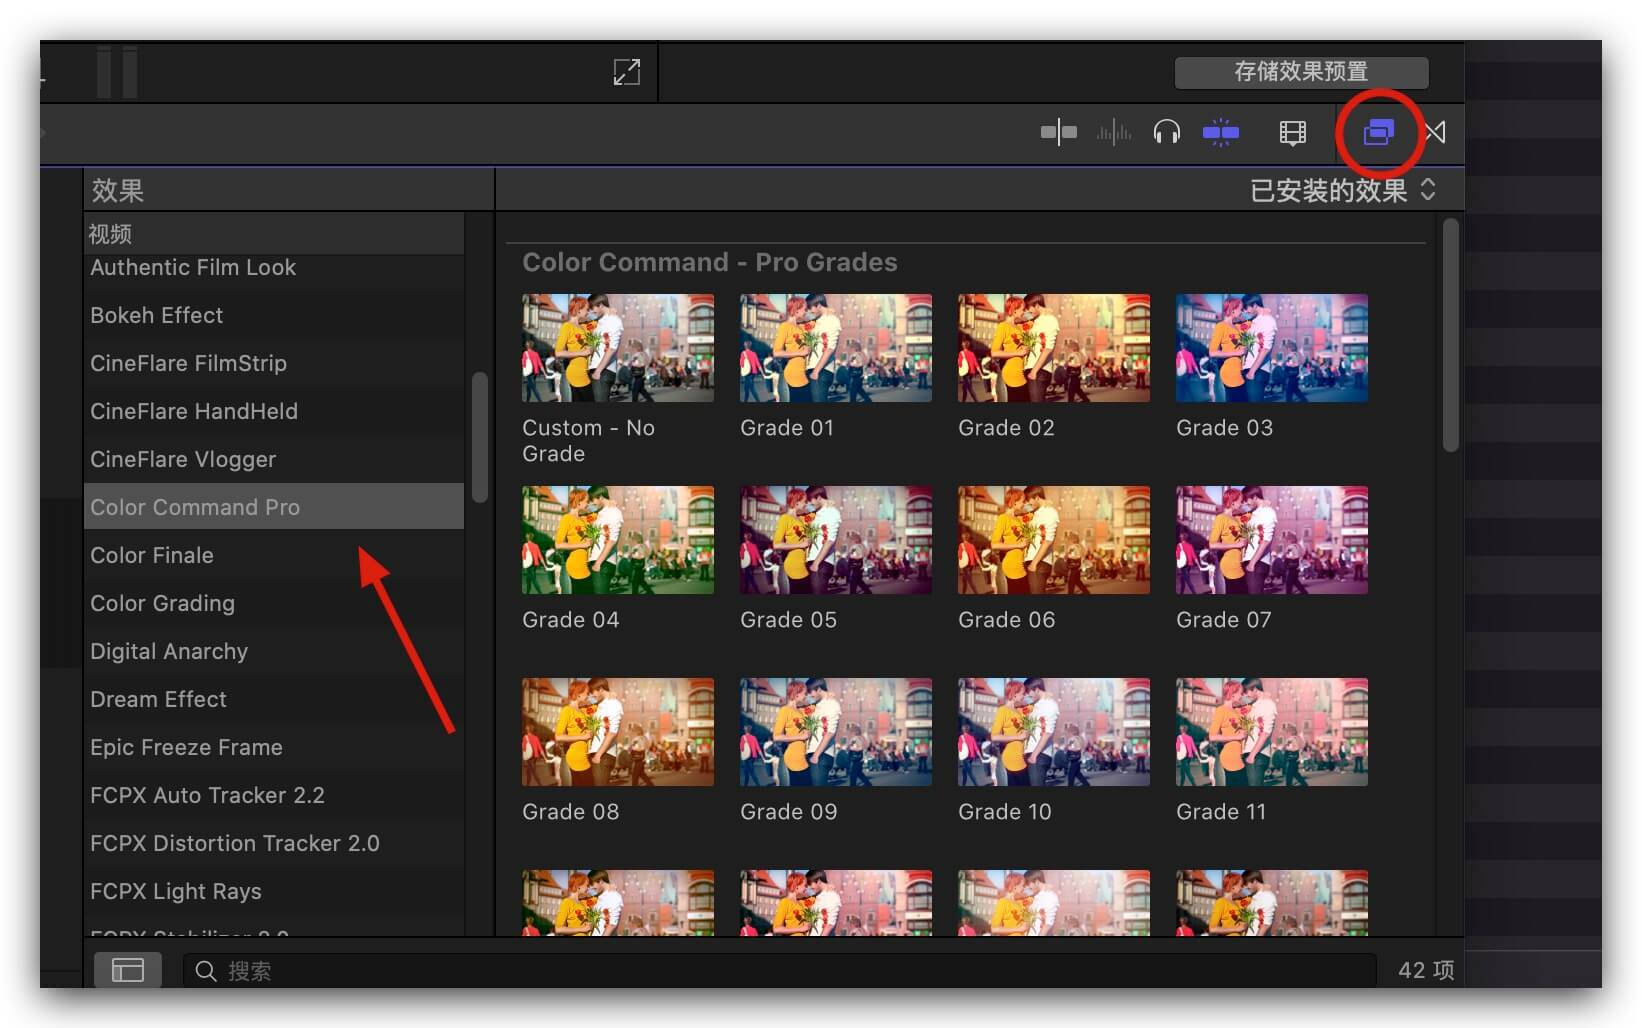 fcpx插件 41组专业分级调色预设+1组快捷手动调色工具 Color Command Pro